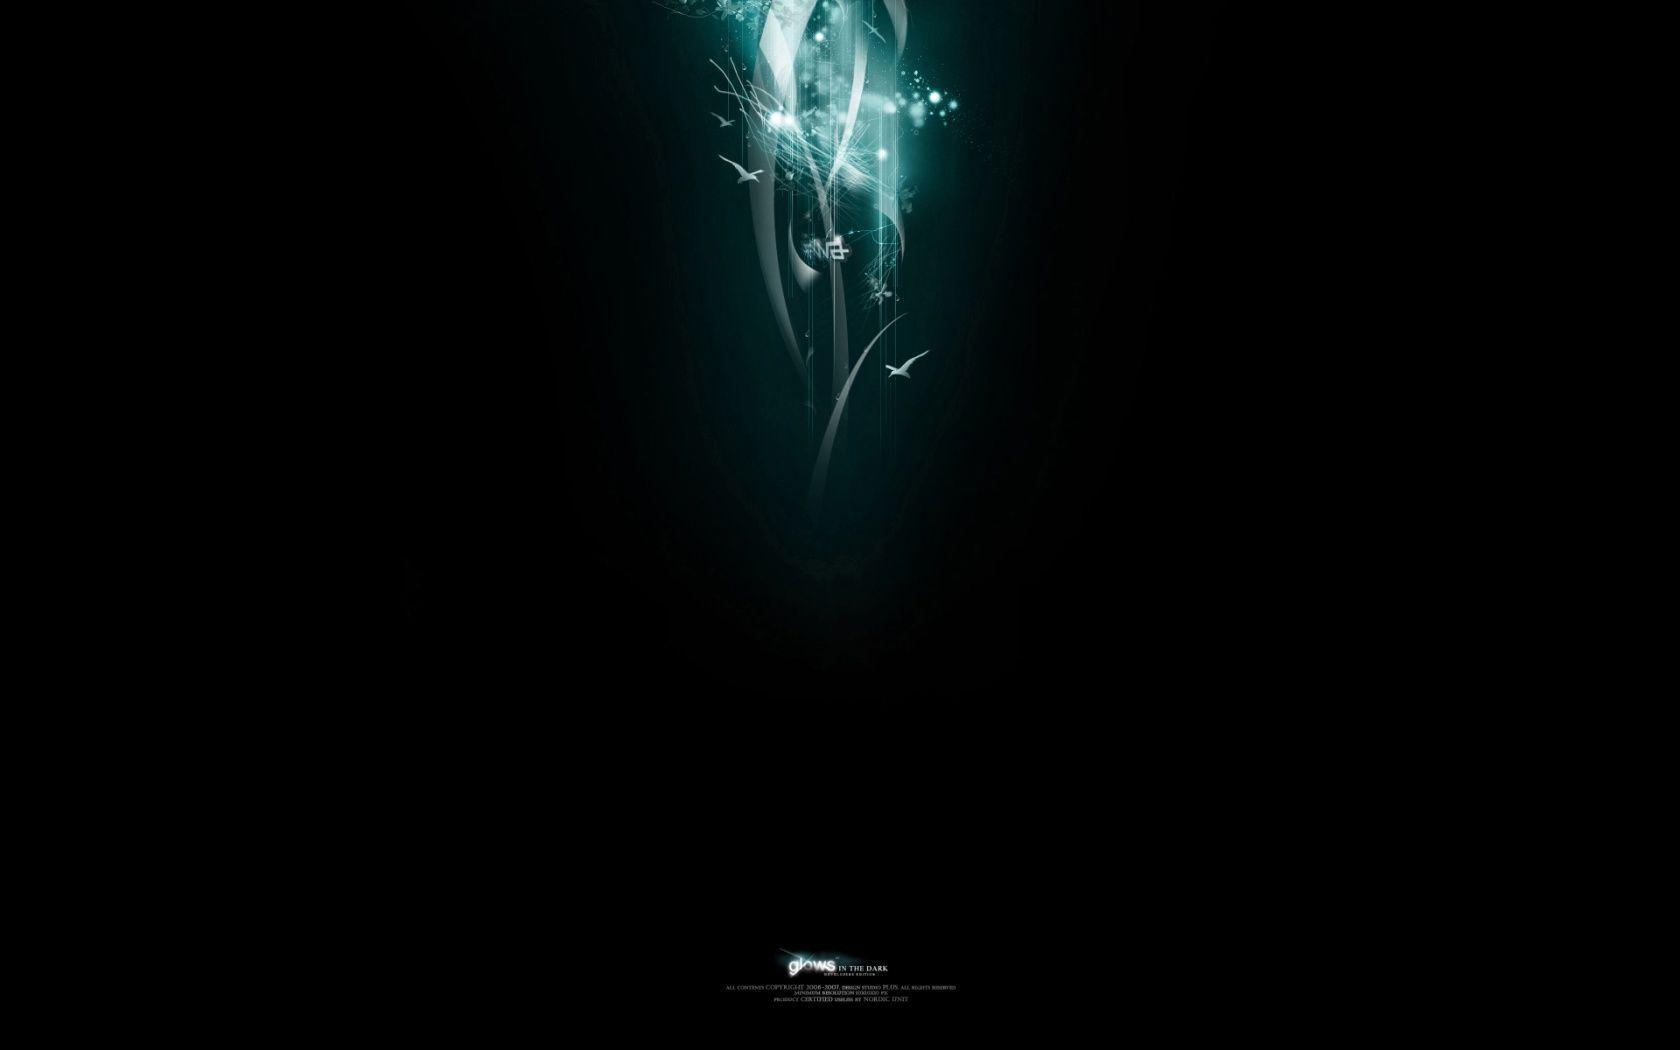 Dark Wallpaper Glows Best Wallpaper Hd Anime Scenery Wallpaper Dark Desktop Backgrounds Hd Dark Wallpapers